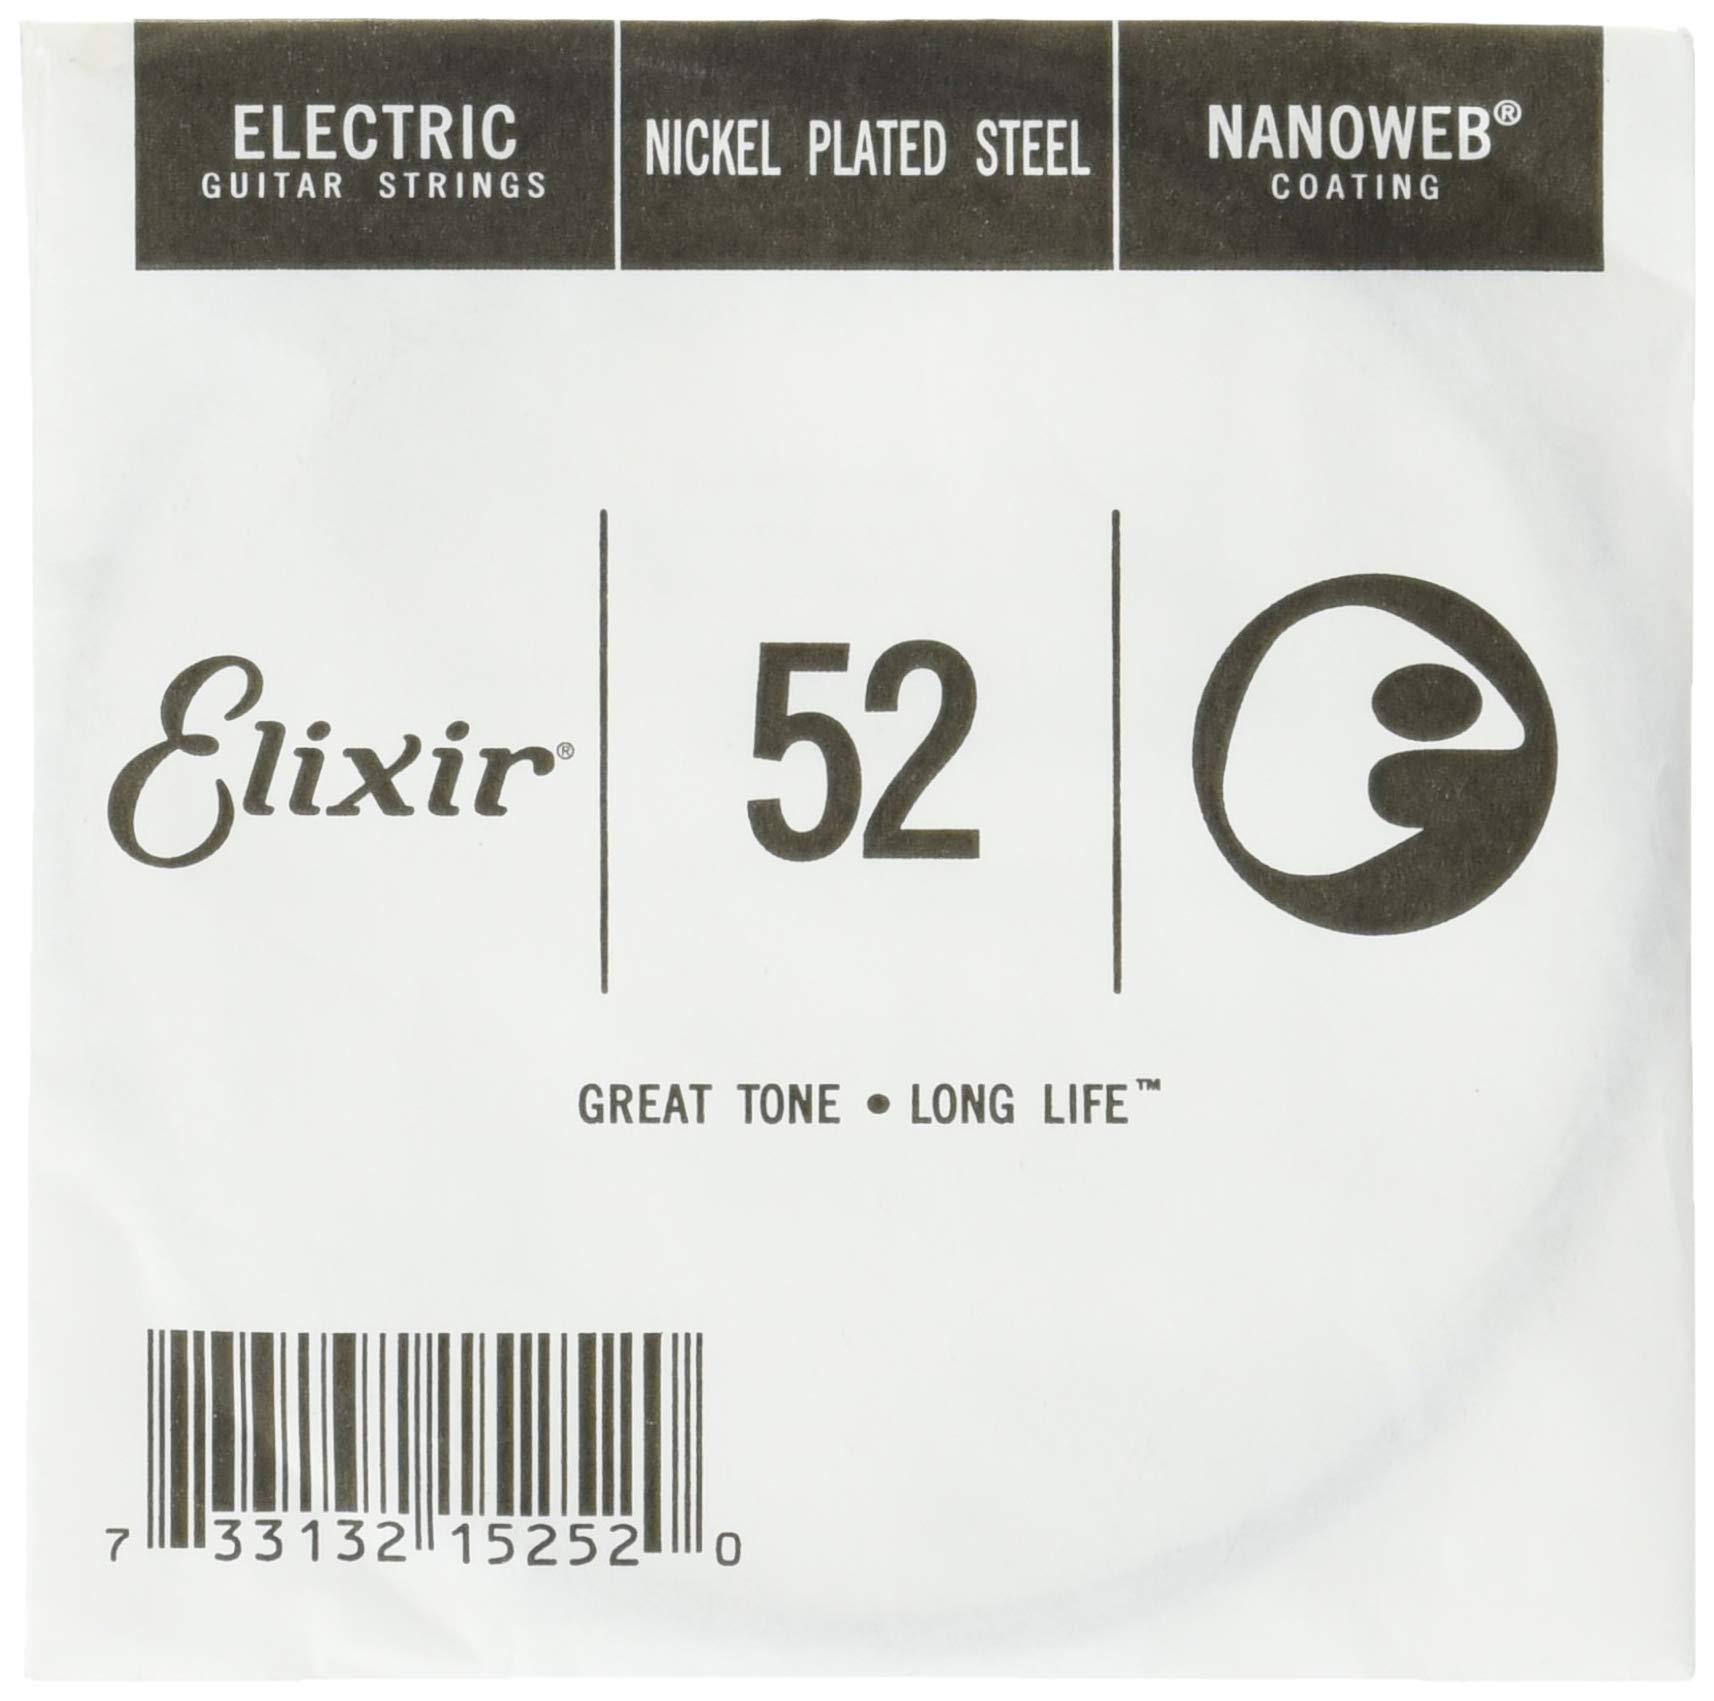 Cheap Elixir Strings Electric Guitar String NANOWEB Coating .052 Black Friday & Cyber Monday 2019